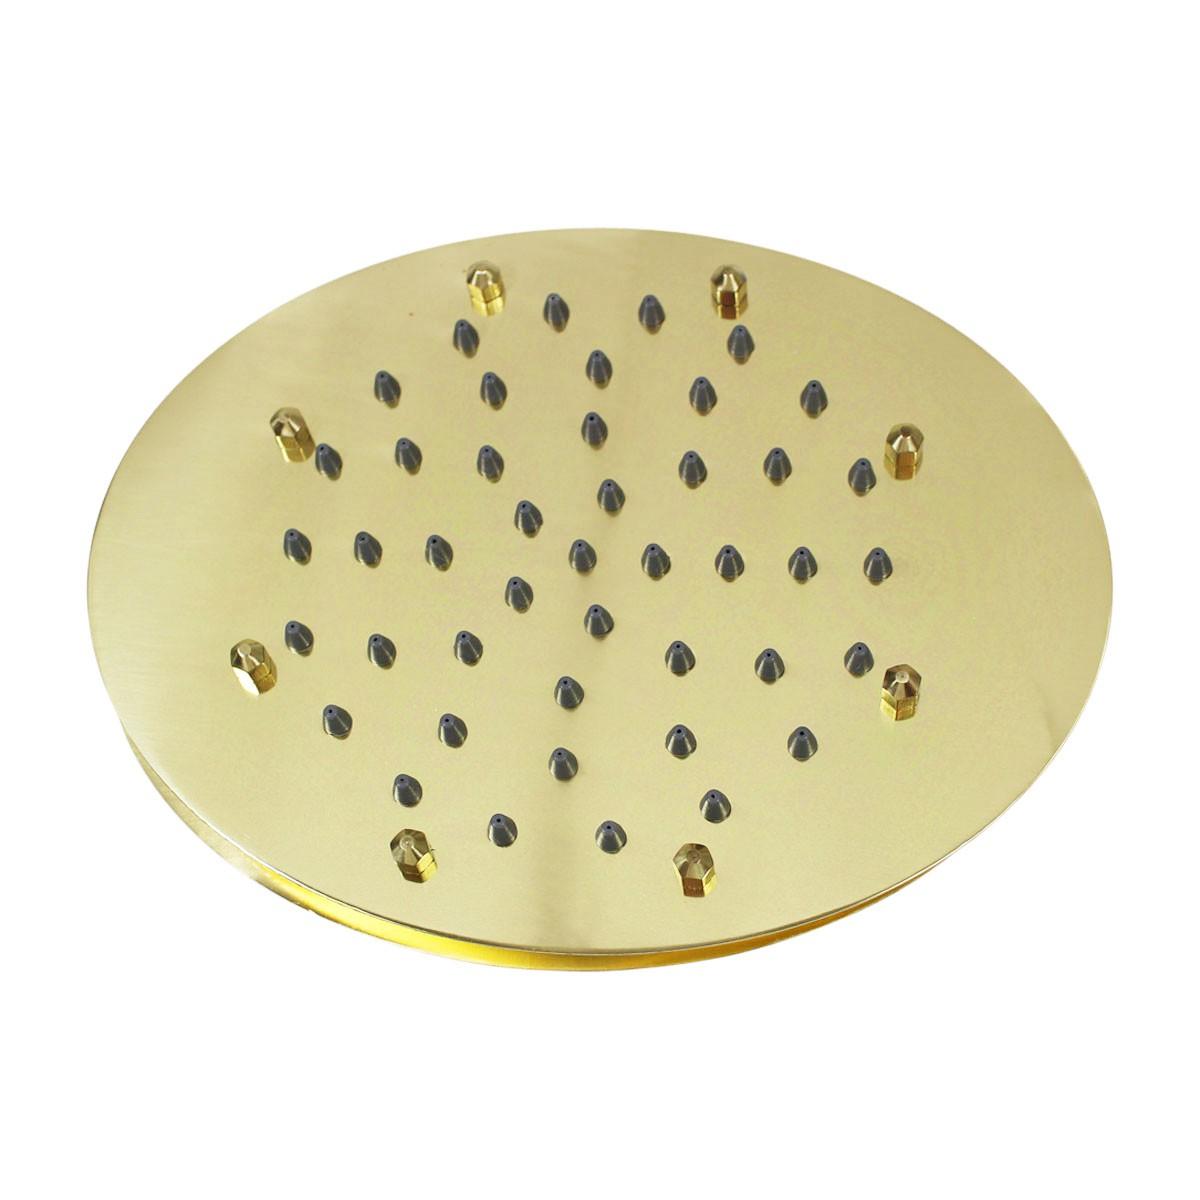 Shower Heads Gold PVD 51 Fine Mist Jets Wall Mount Shower Head Shower Heads Bath Shower Head